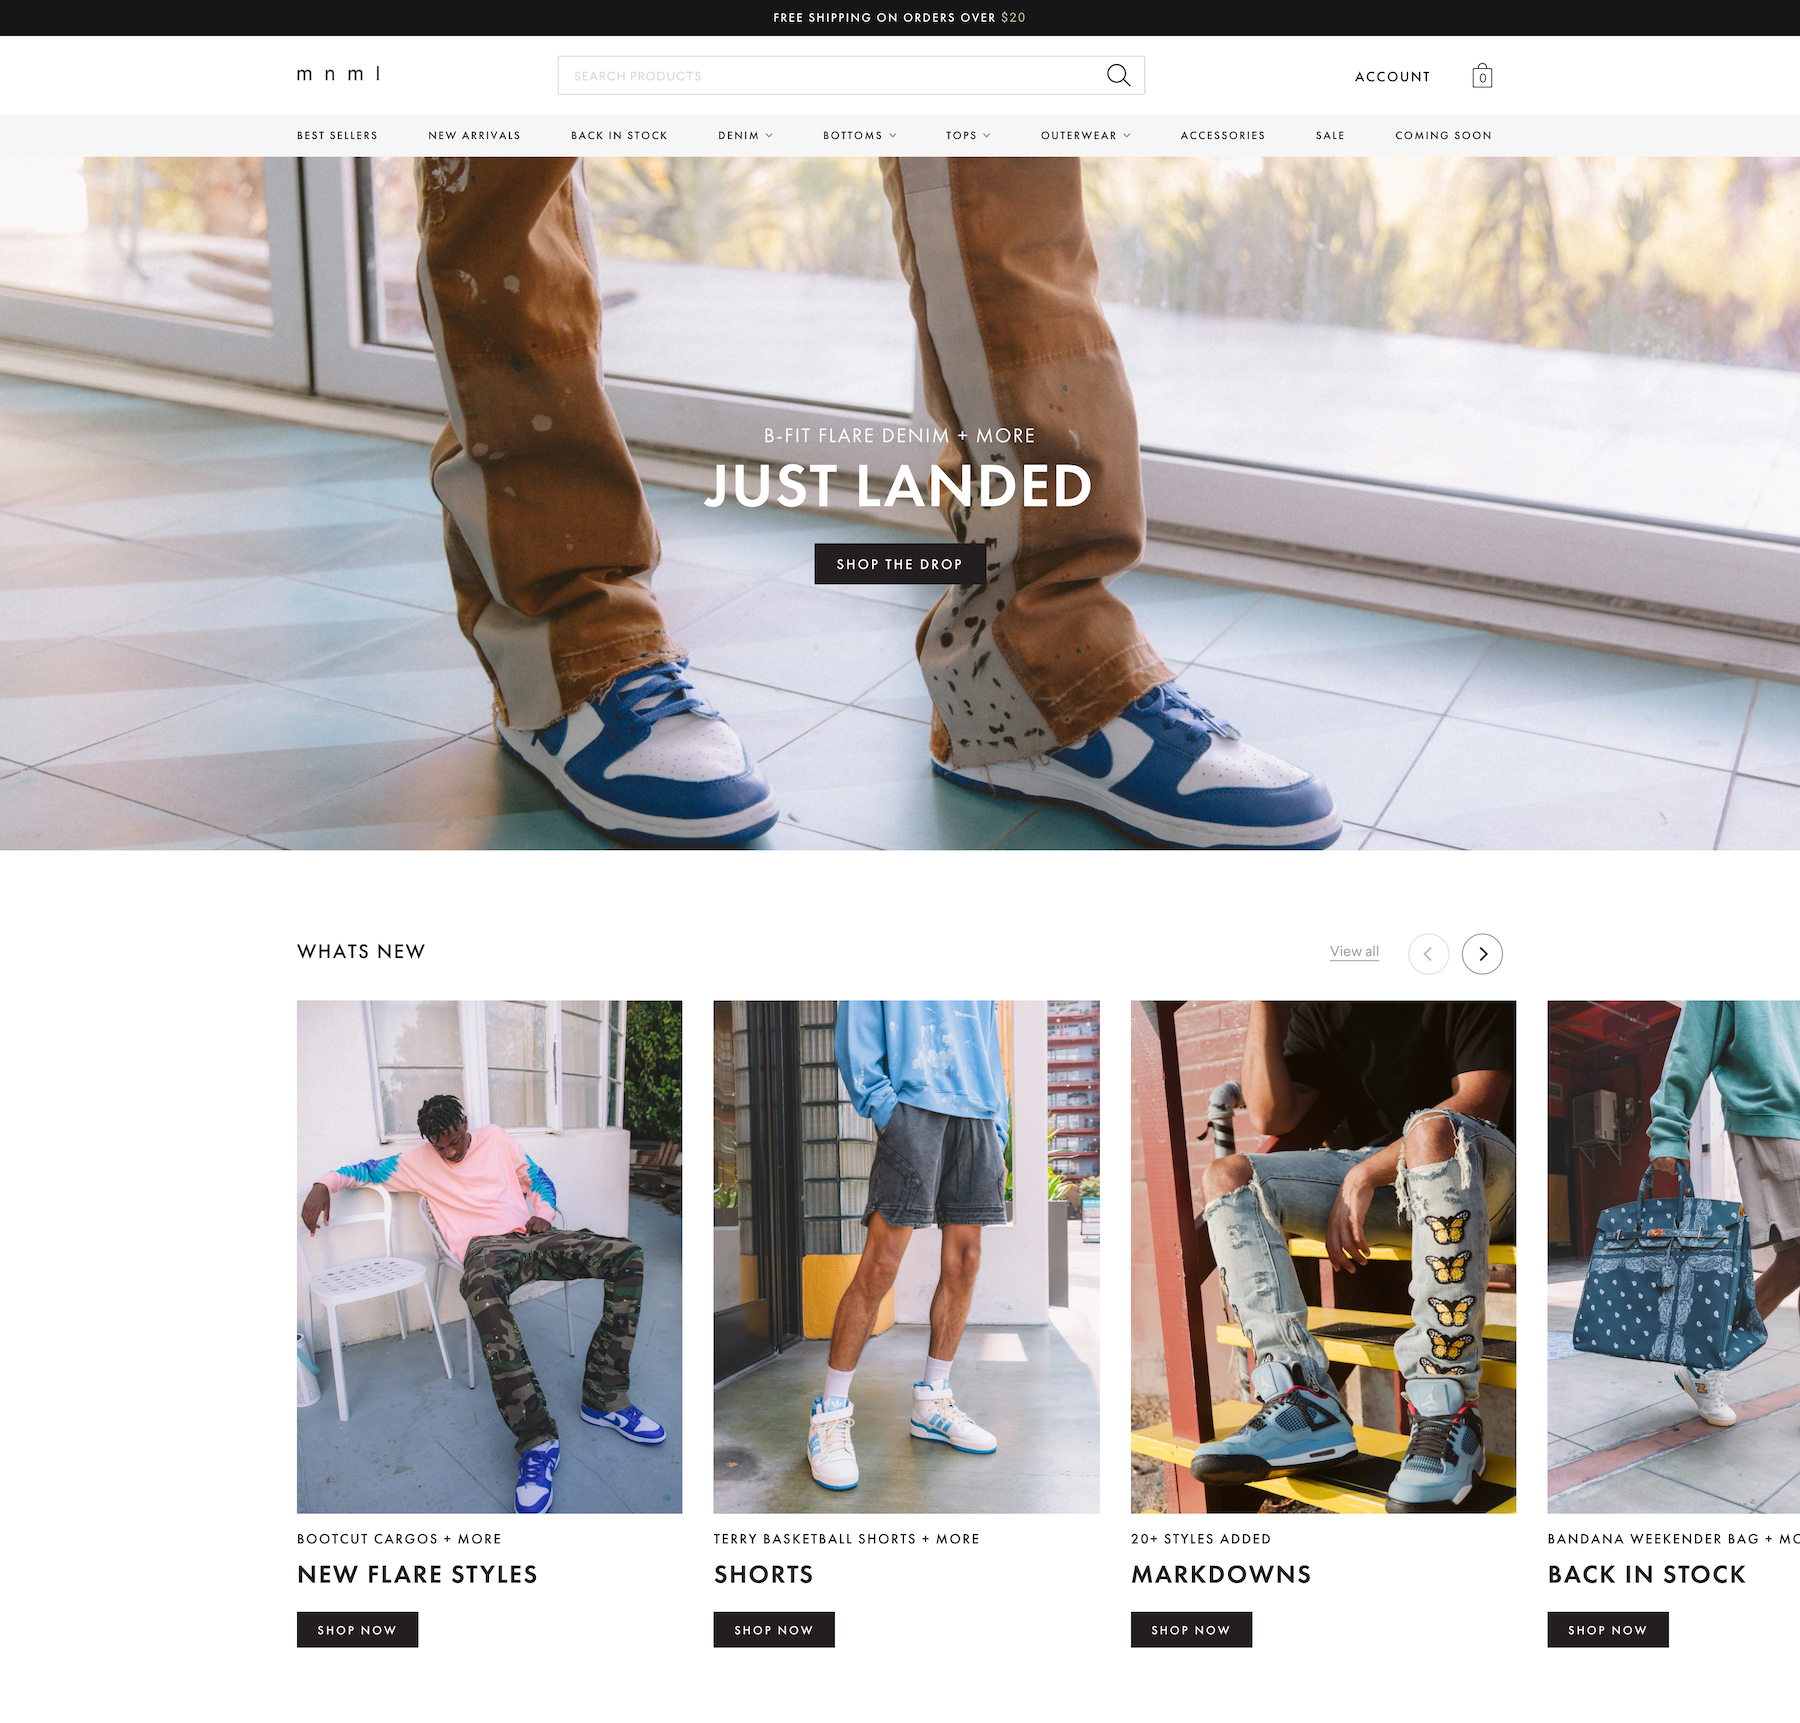 mnml homepage top half apparel denim